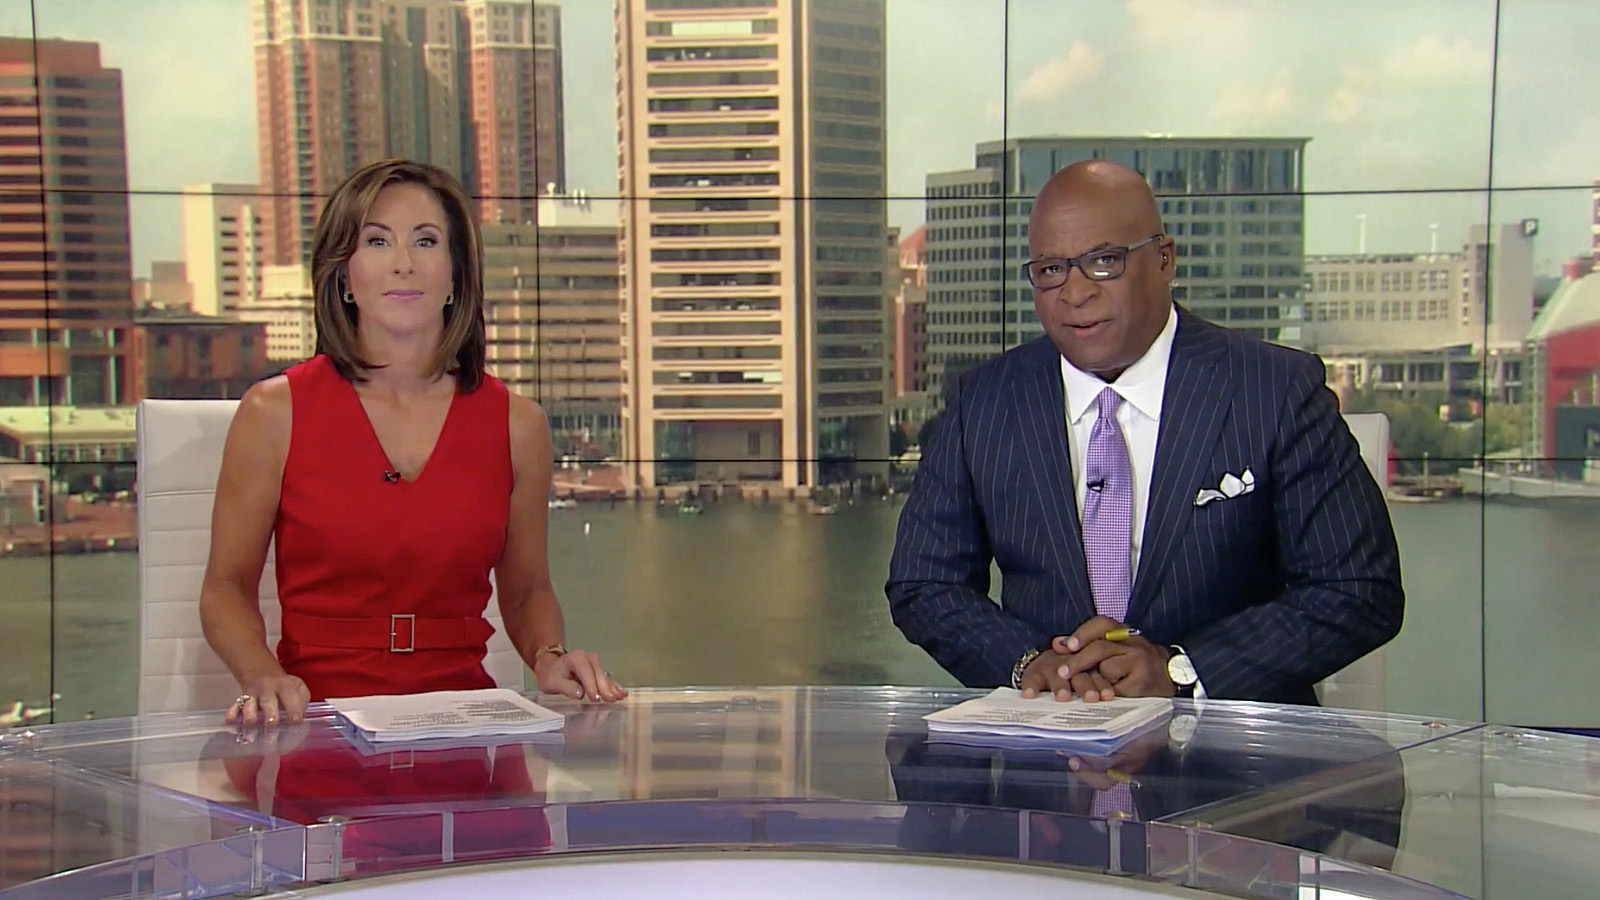 ncs_WJZ-CBS-13-Baltimore-TV-Studio_0005